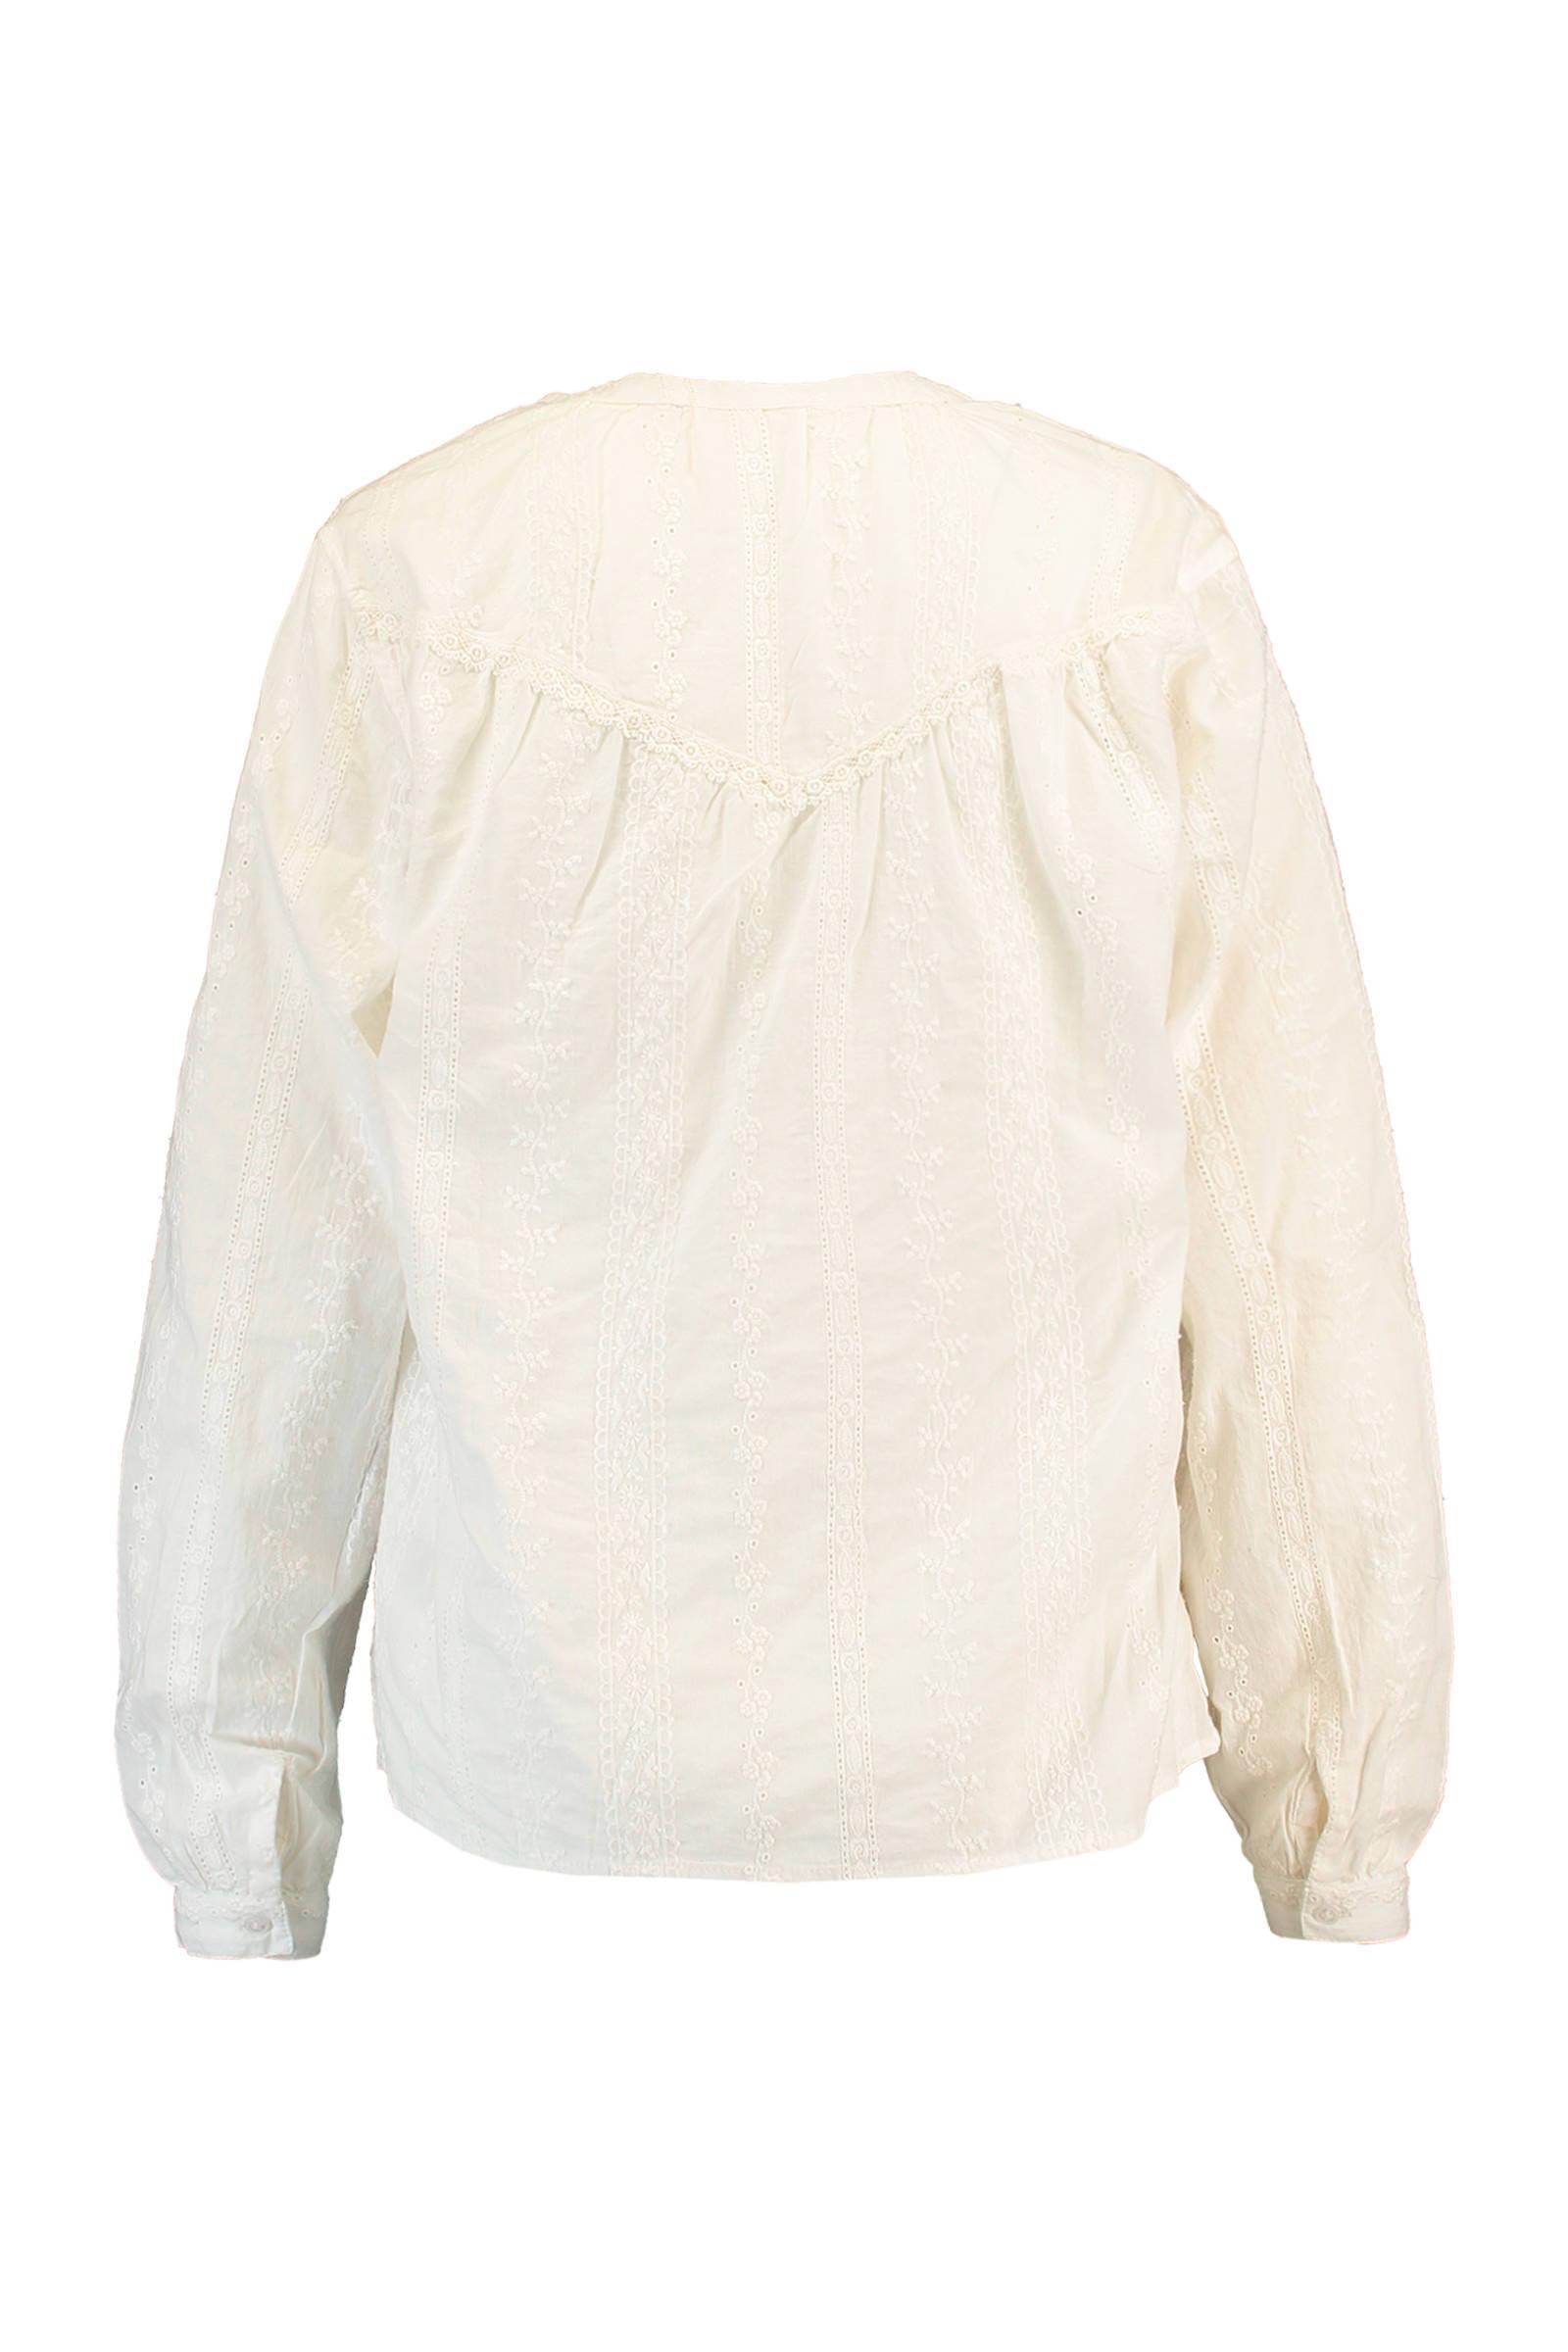 Today America met borduursels blouse wit gebroken xxASrdw